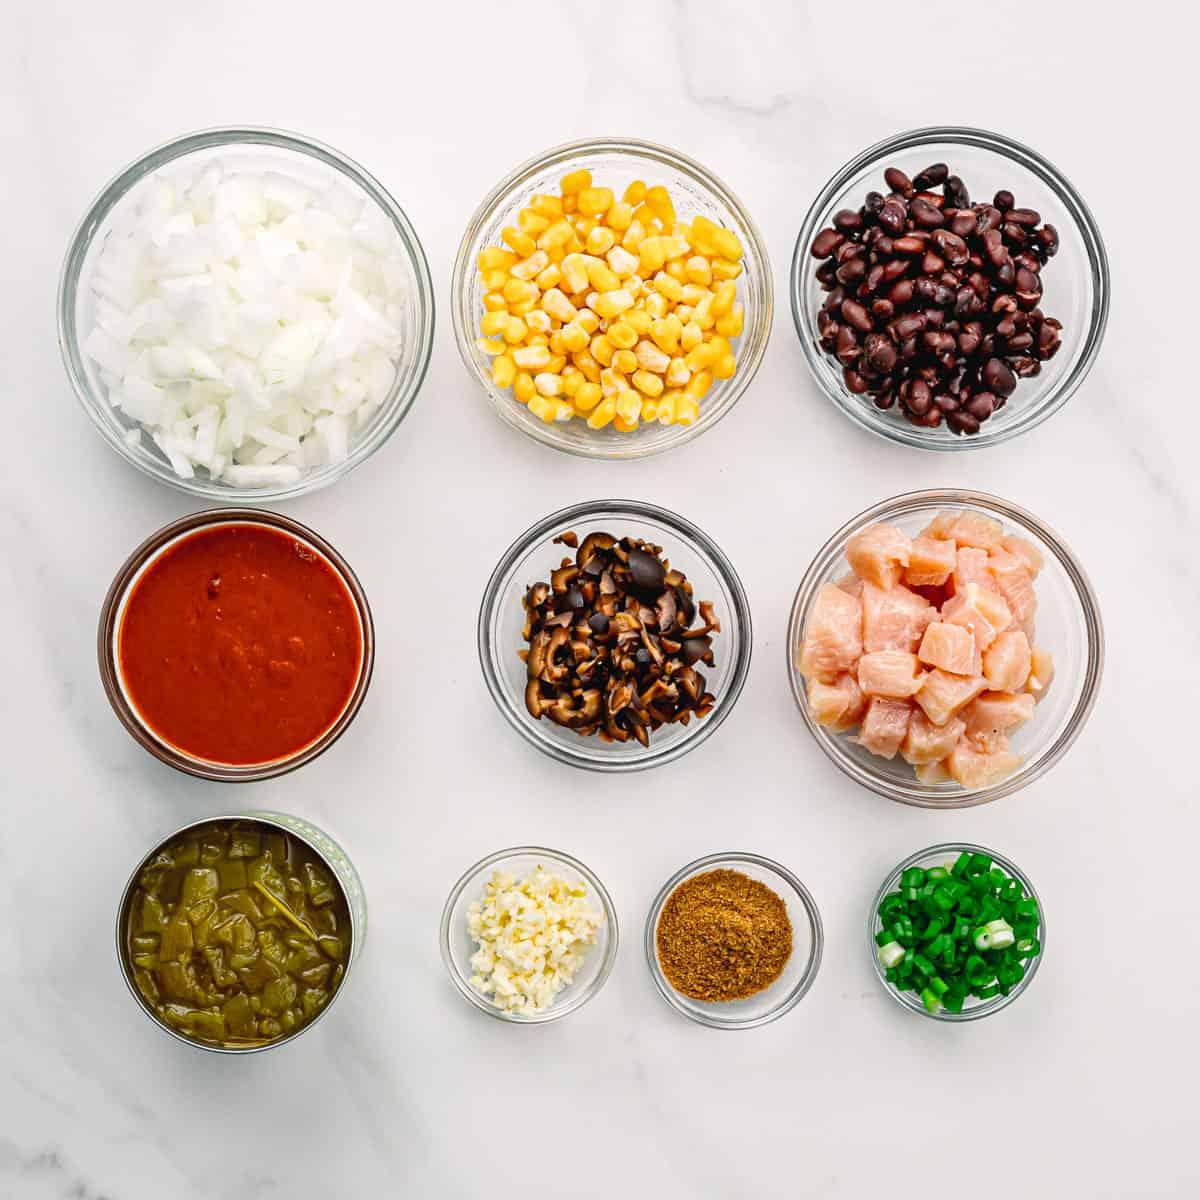 the ingredients to make enchiladas.